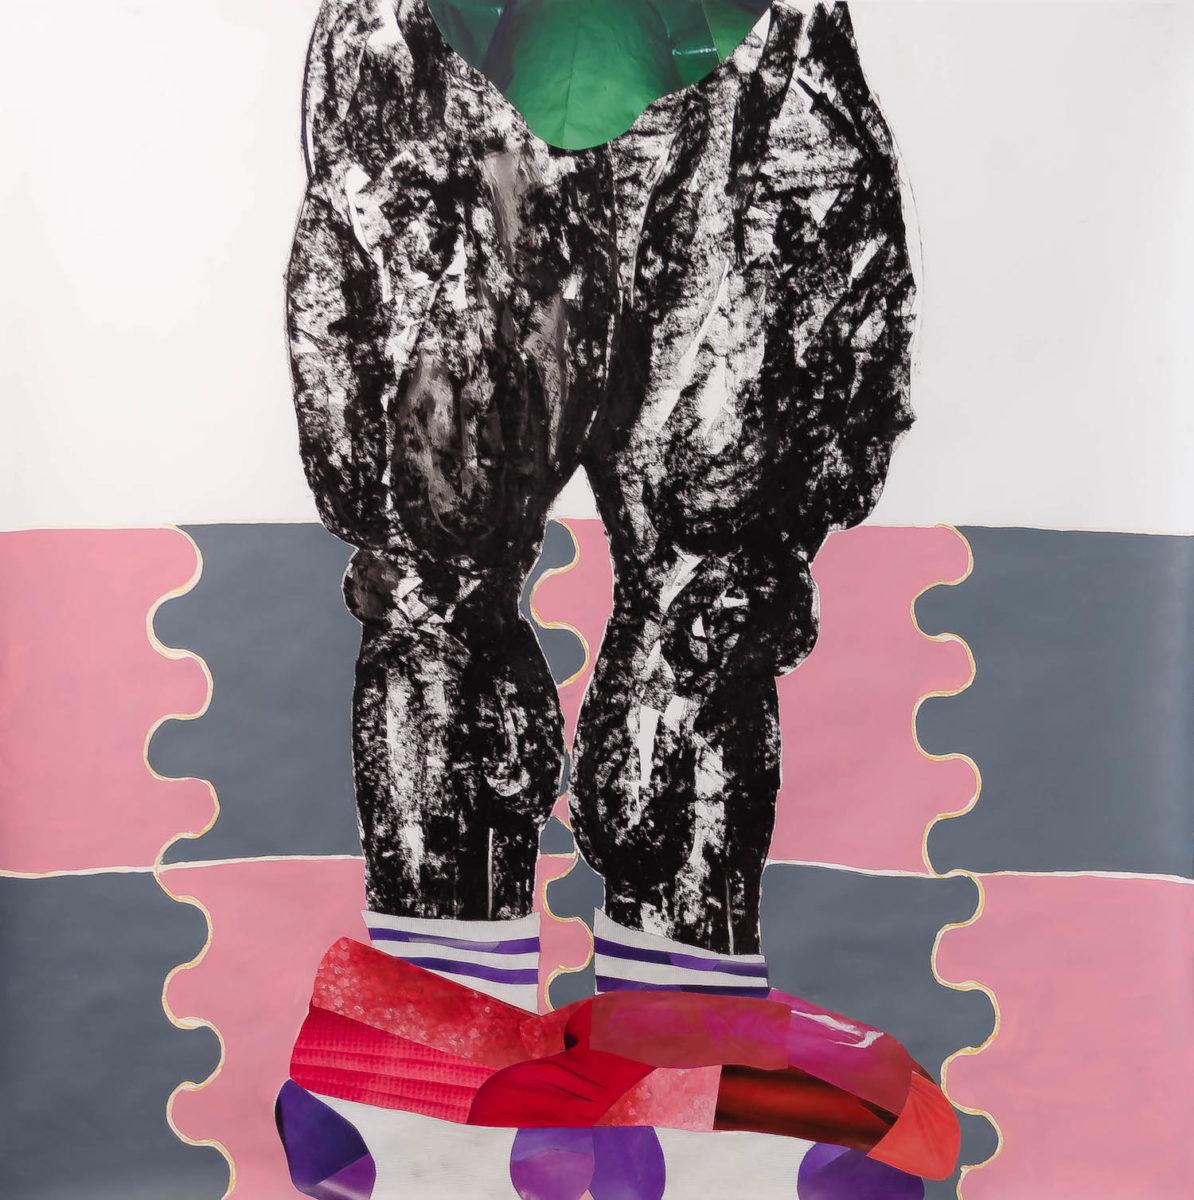 Clotilde Jimenez, Pose No. 5, 2020, Courtesy of the Artist and Mariane Ibrahim